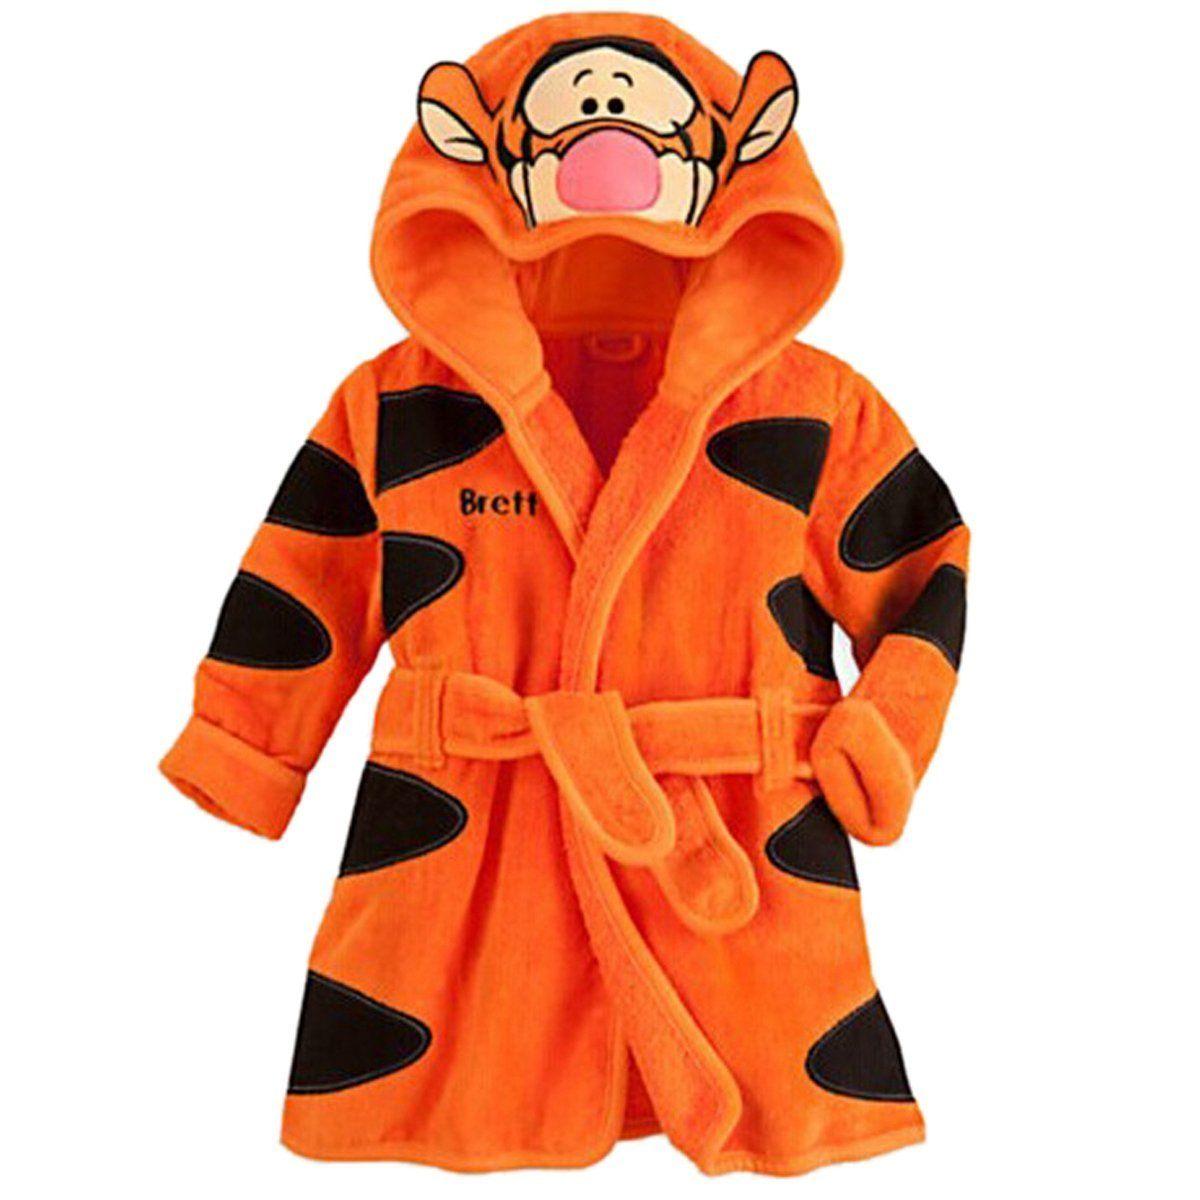 Baby Kinder Bademantel Kapuze Bathrobe Fleece Warm Nachtwäsche Pajamas Sleepwear